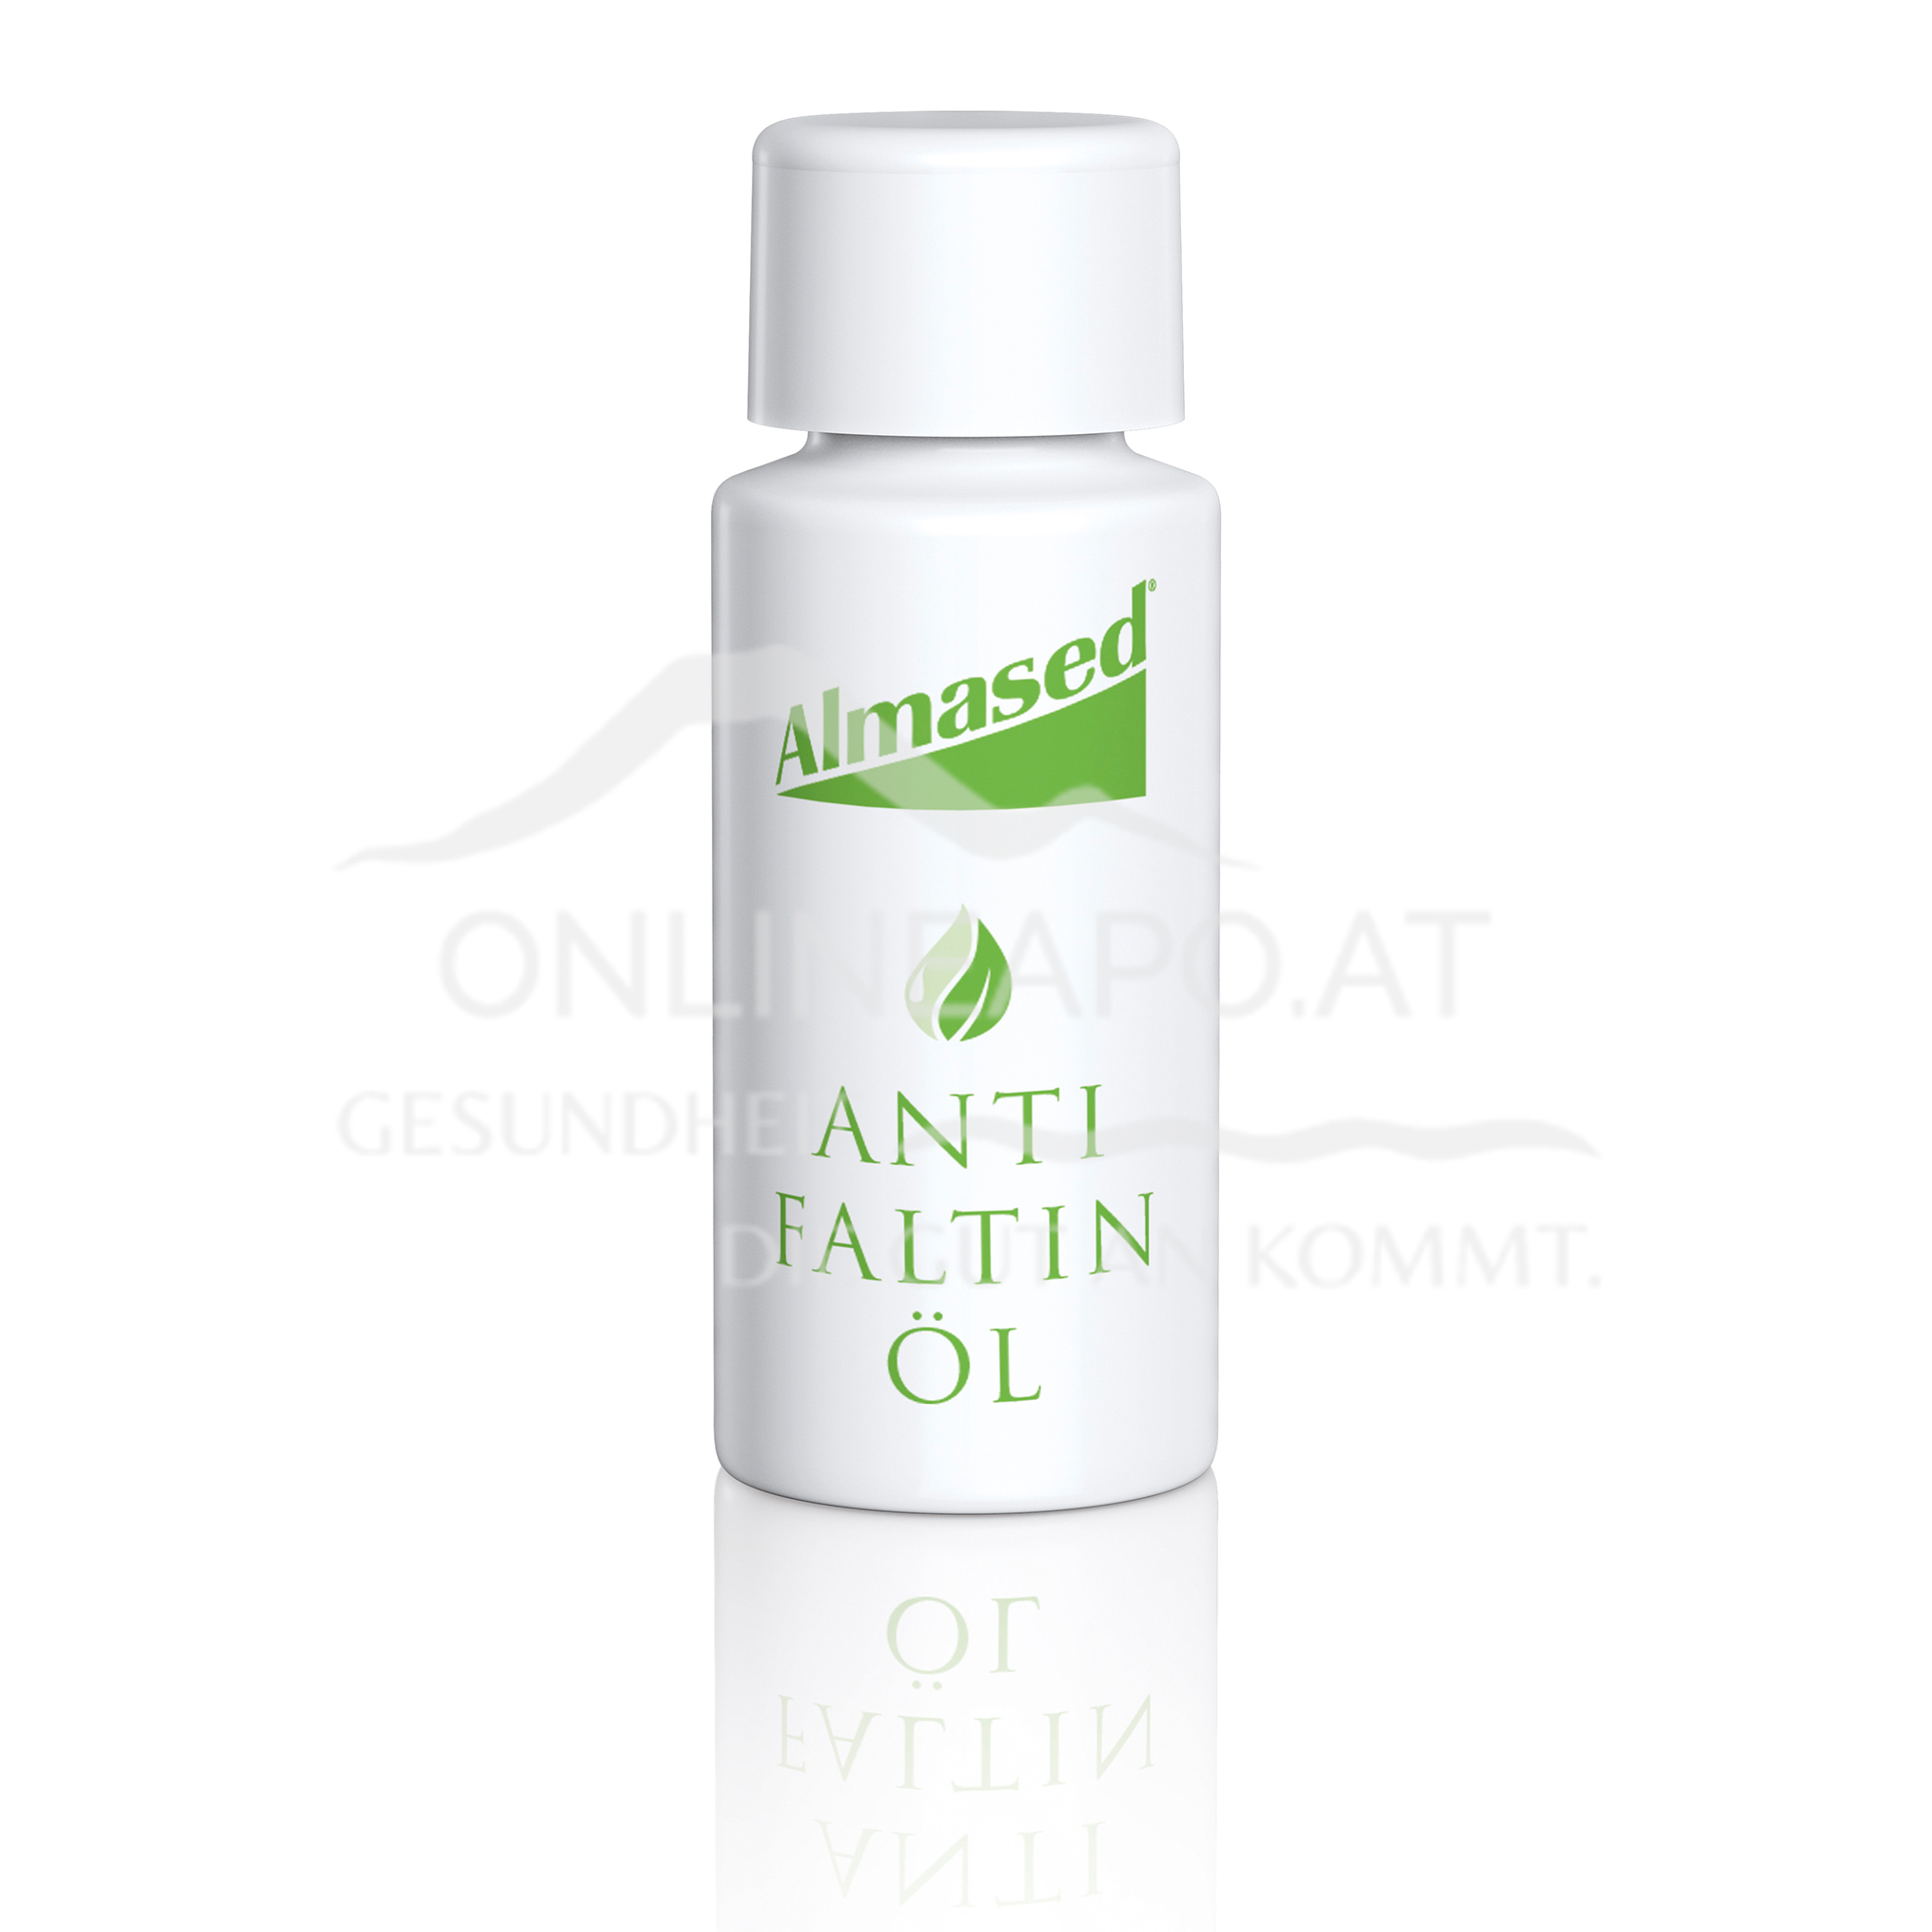 Almased® Antifaltin-Öl